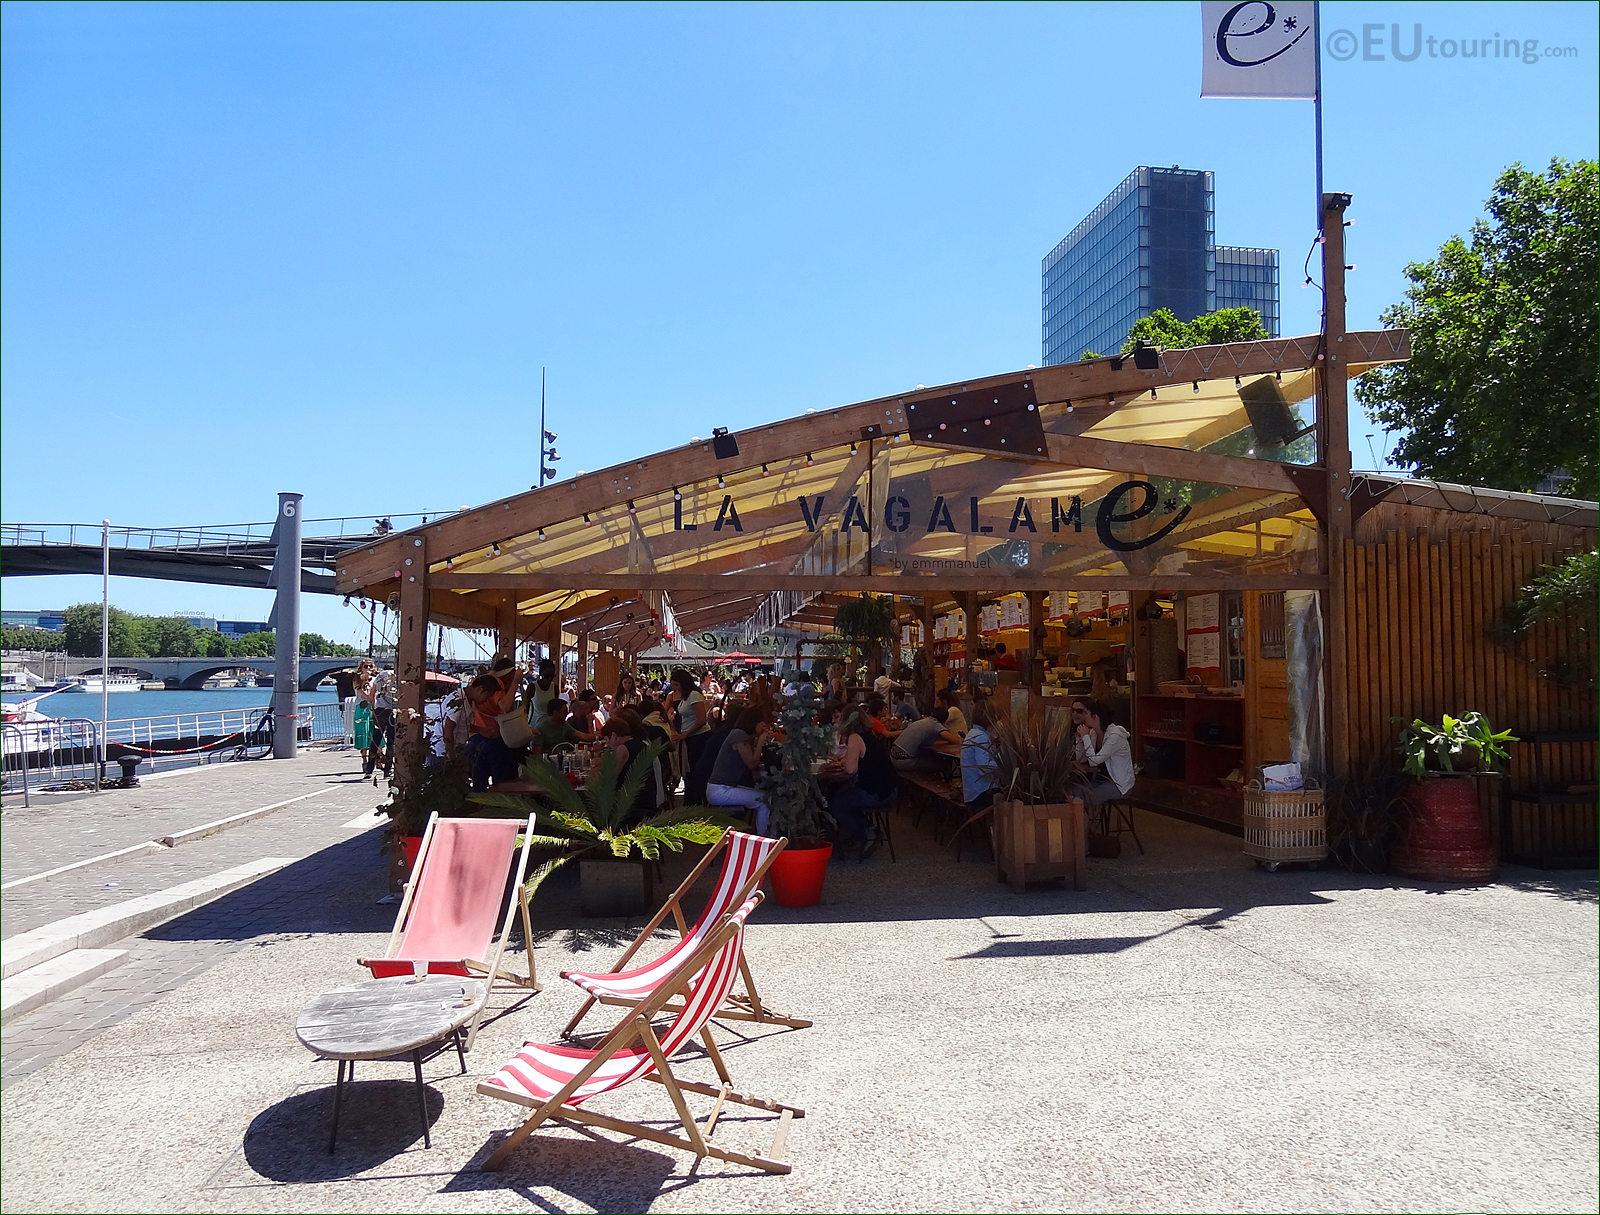 Hd photographs of la vagalame restaurant in paris france - Restaurant seine port ...